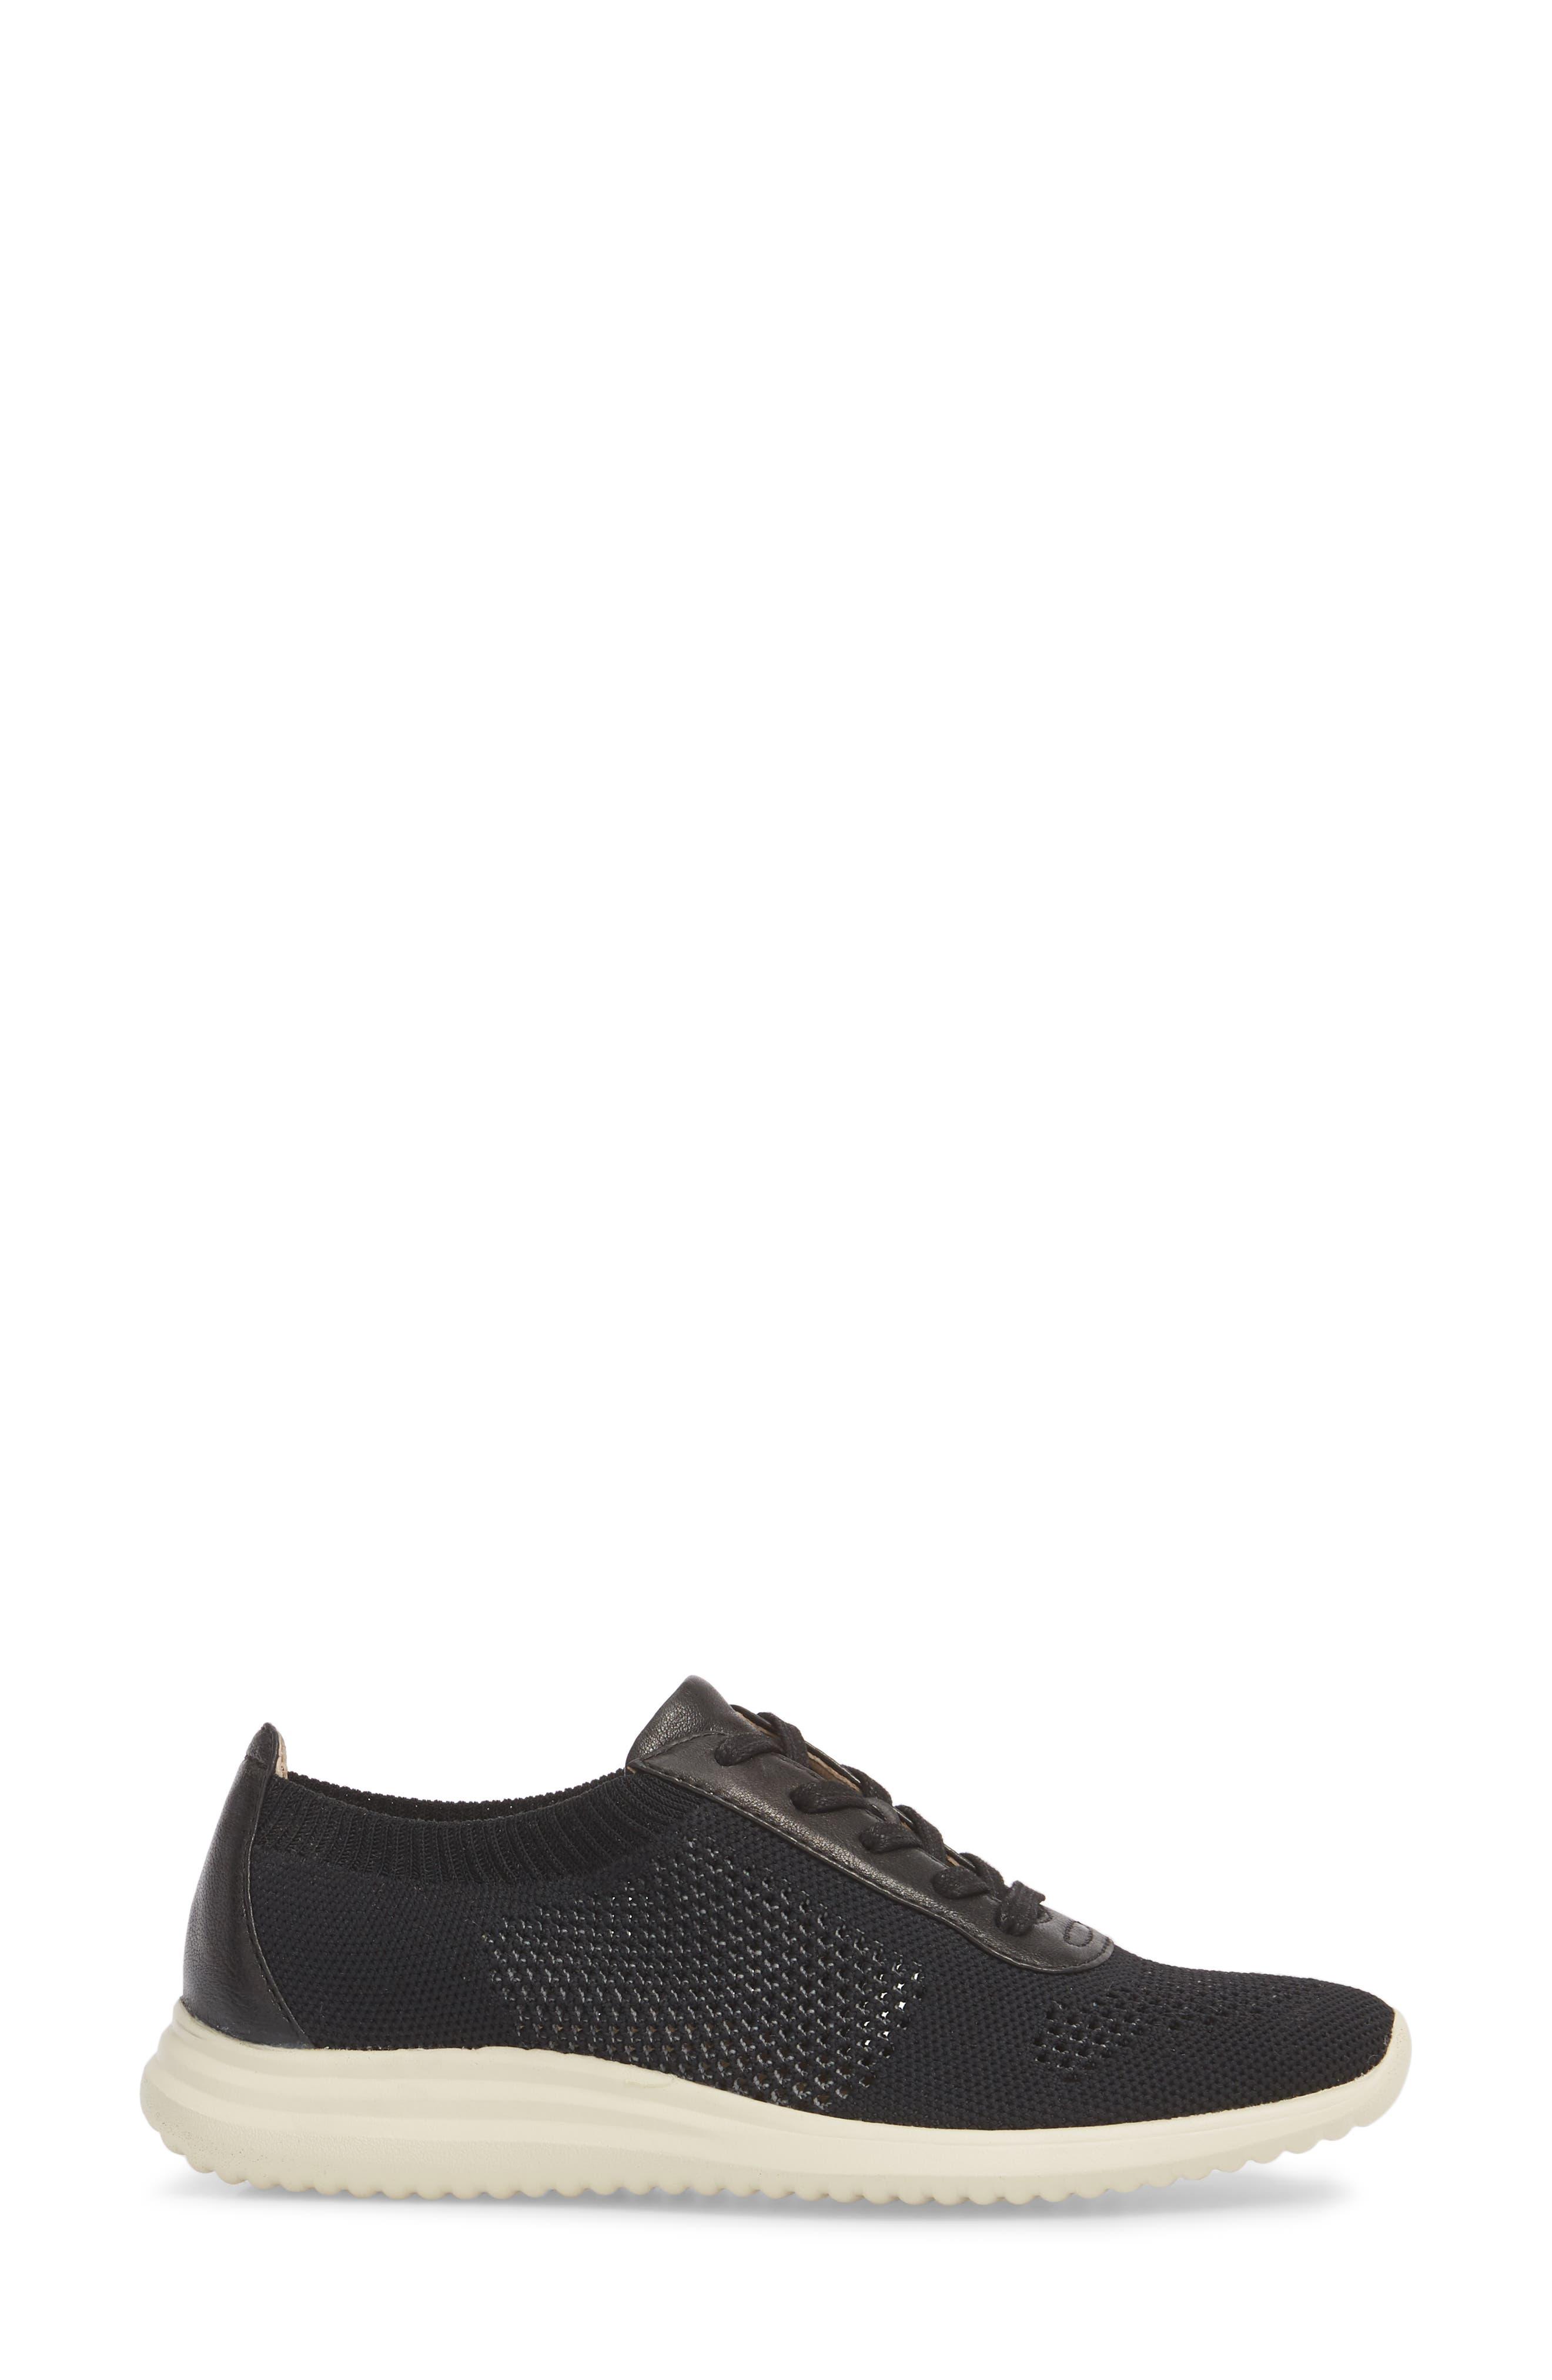 Novella Sneaker,                             Alternate thumbnail 3, color,                             001